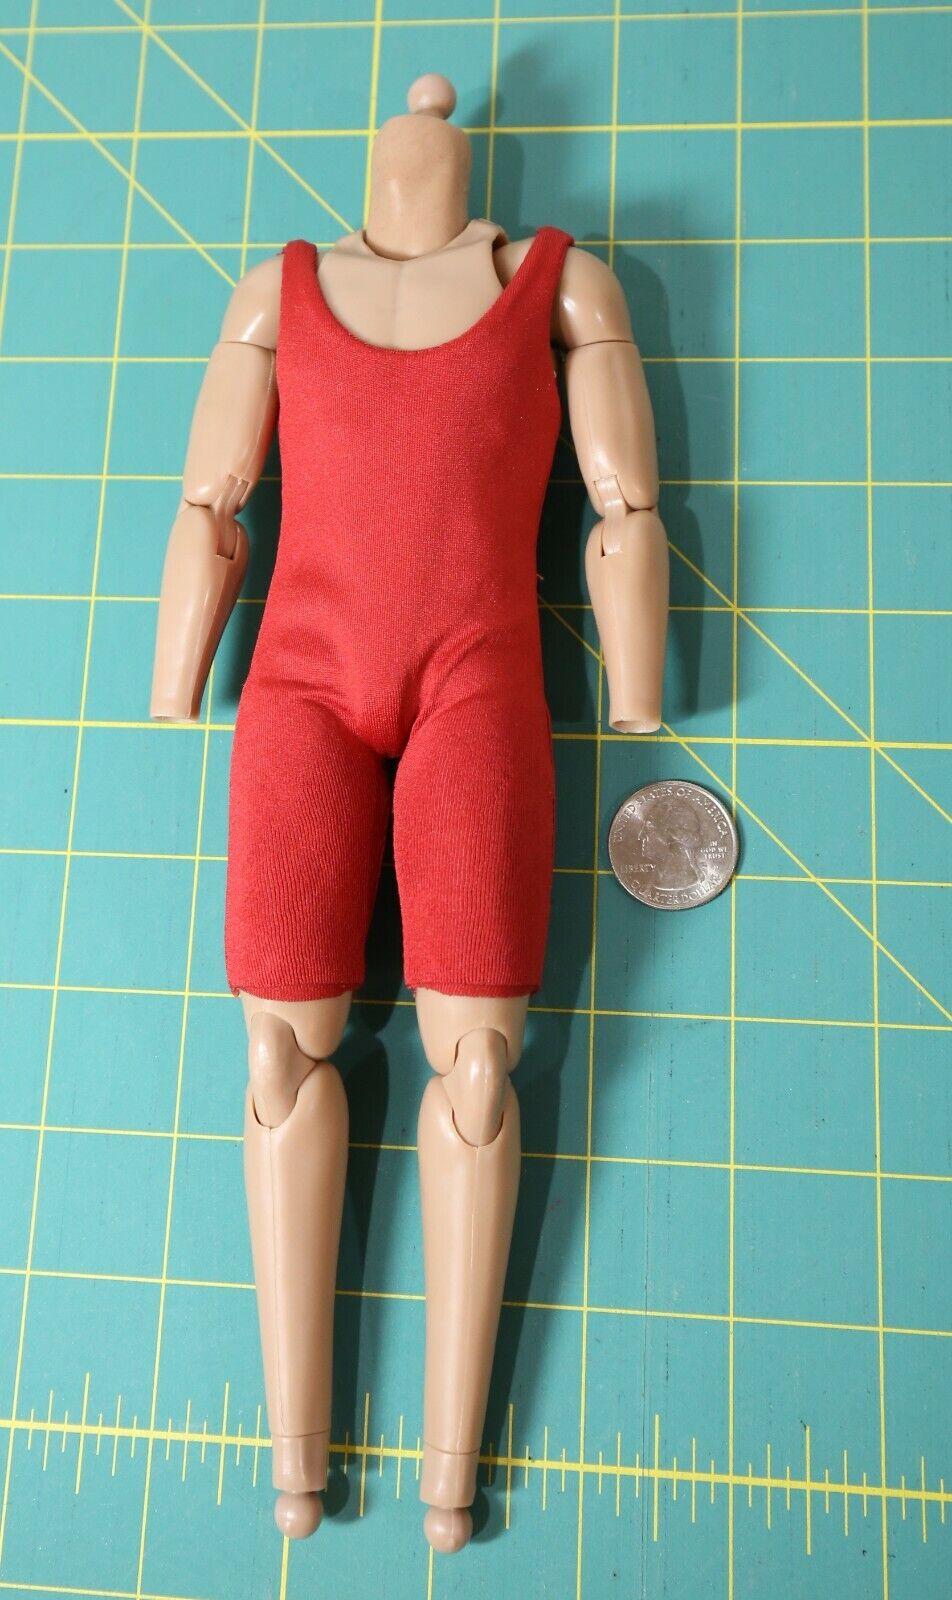 Sideshow 1 6 Scale Body Luke Skywalker X-Wing Pilot Action Figure & Neck Peg